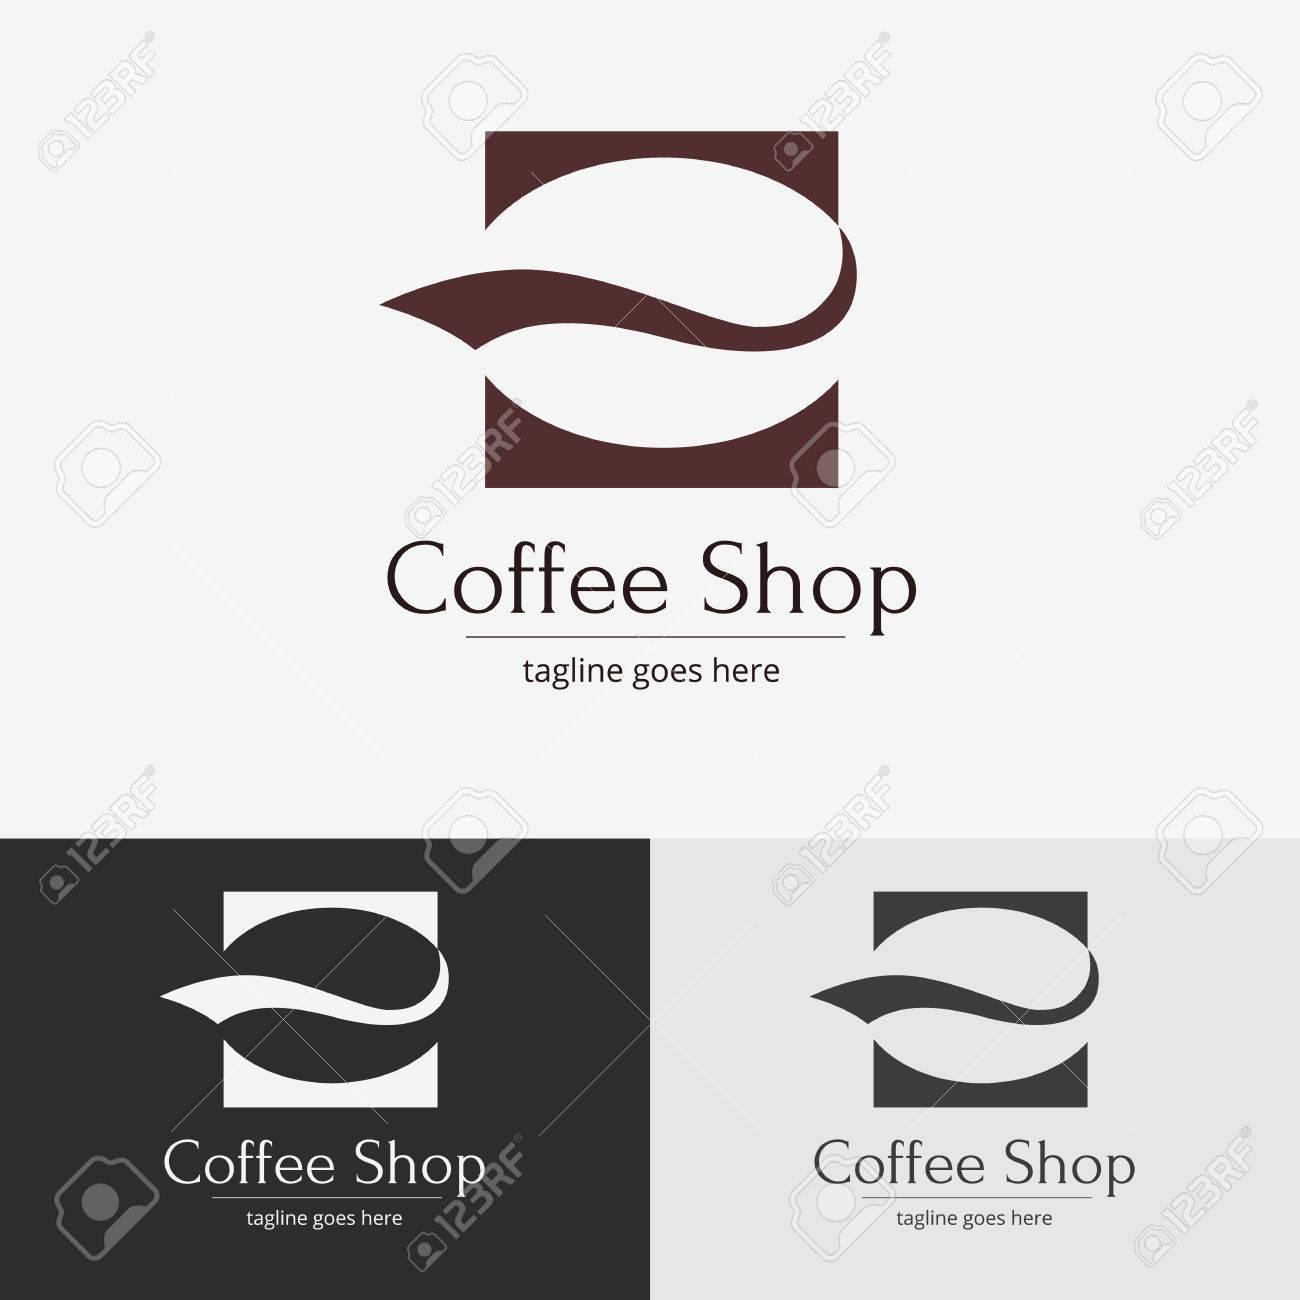 Coffee shop design  Vector symbol for design